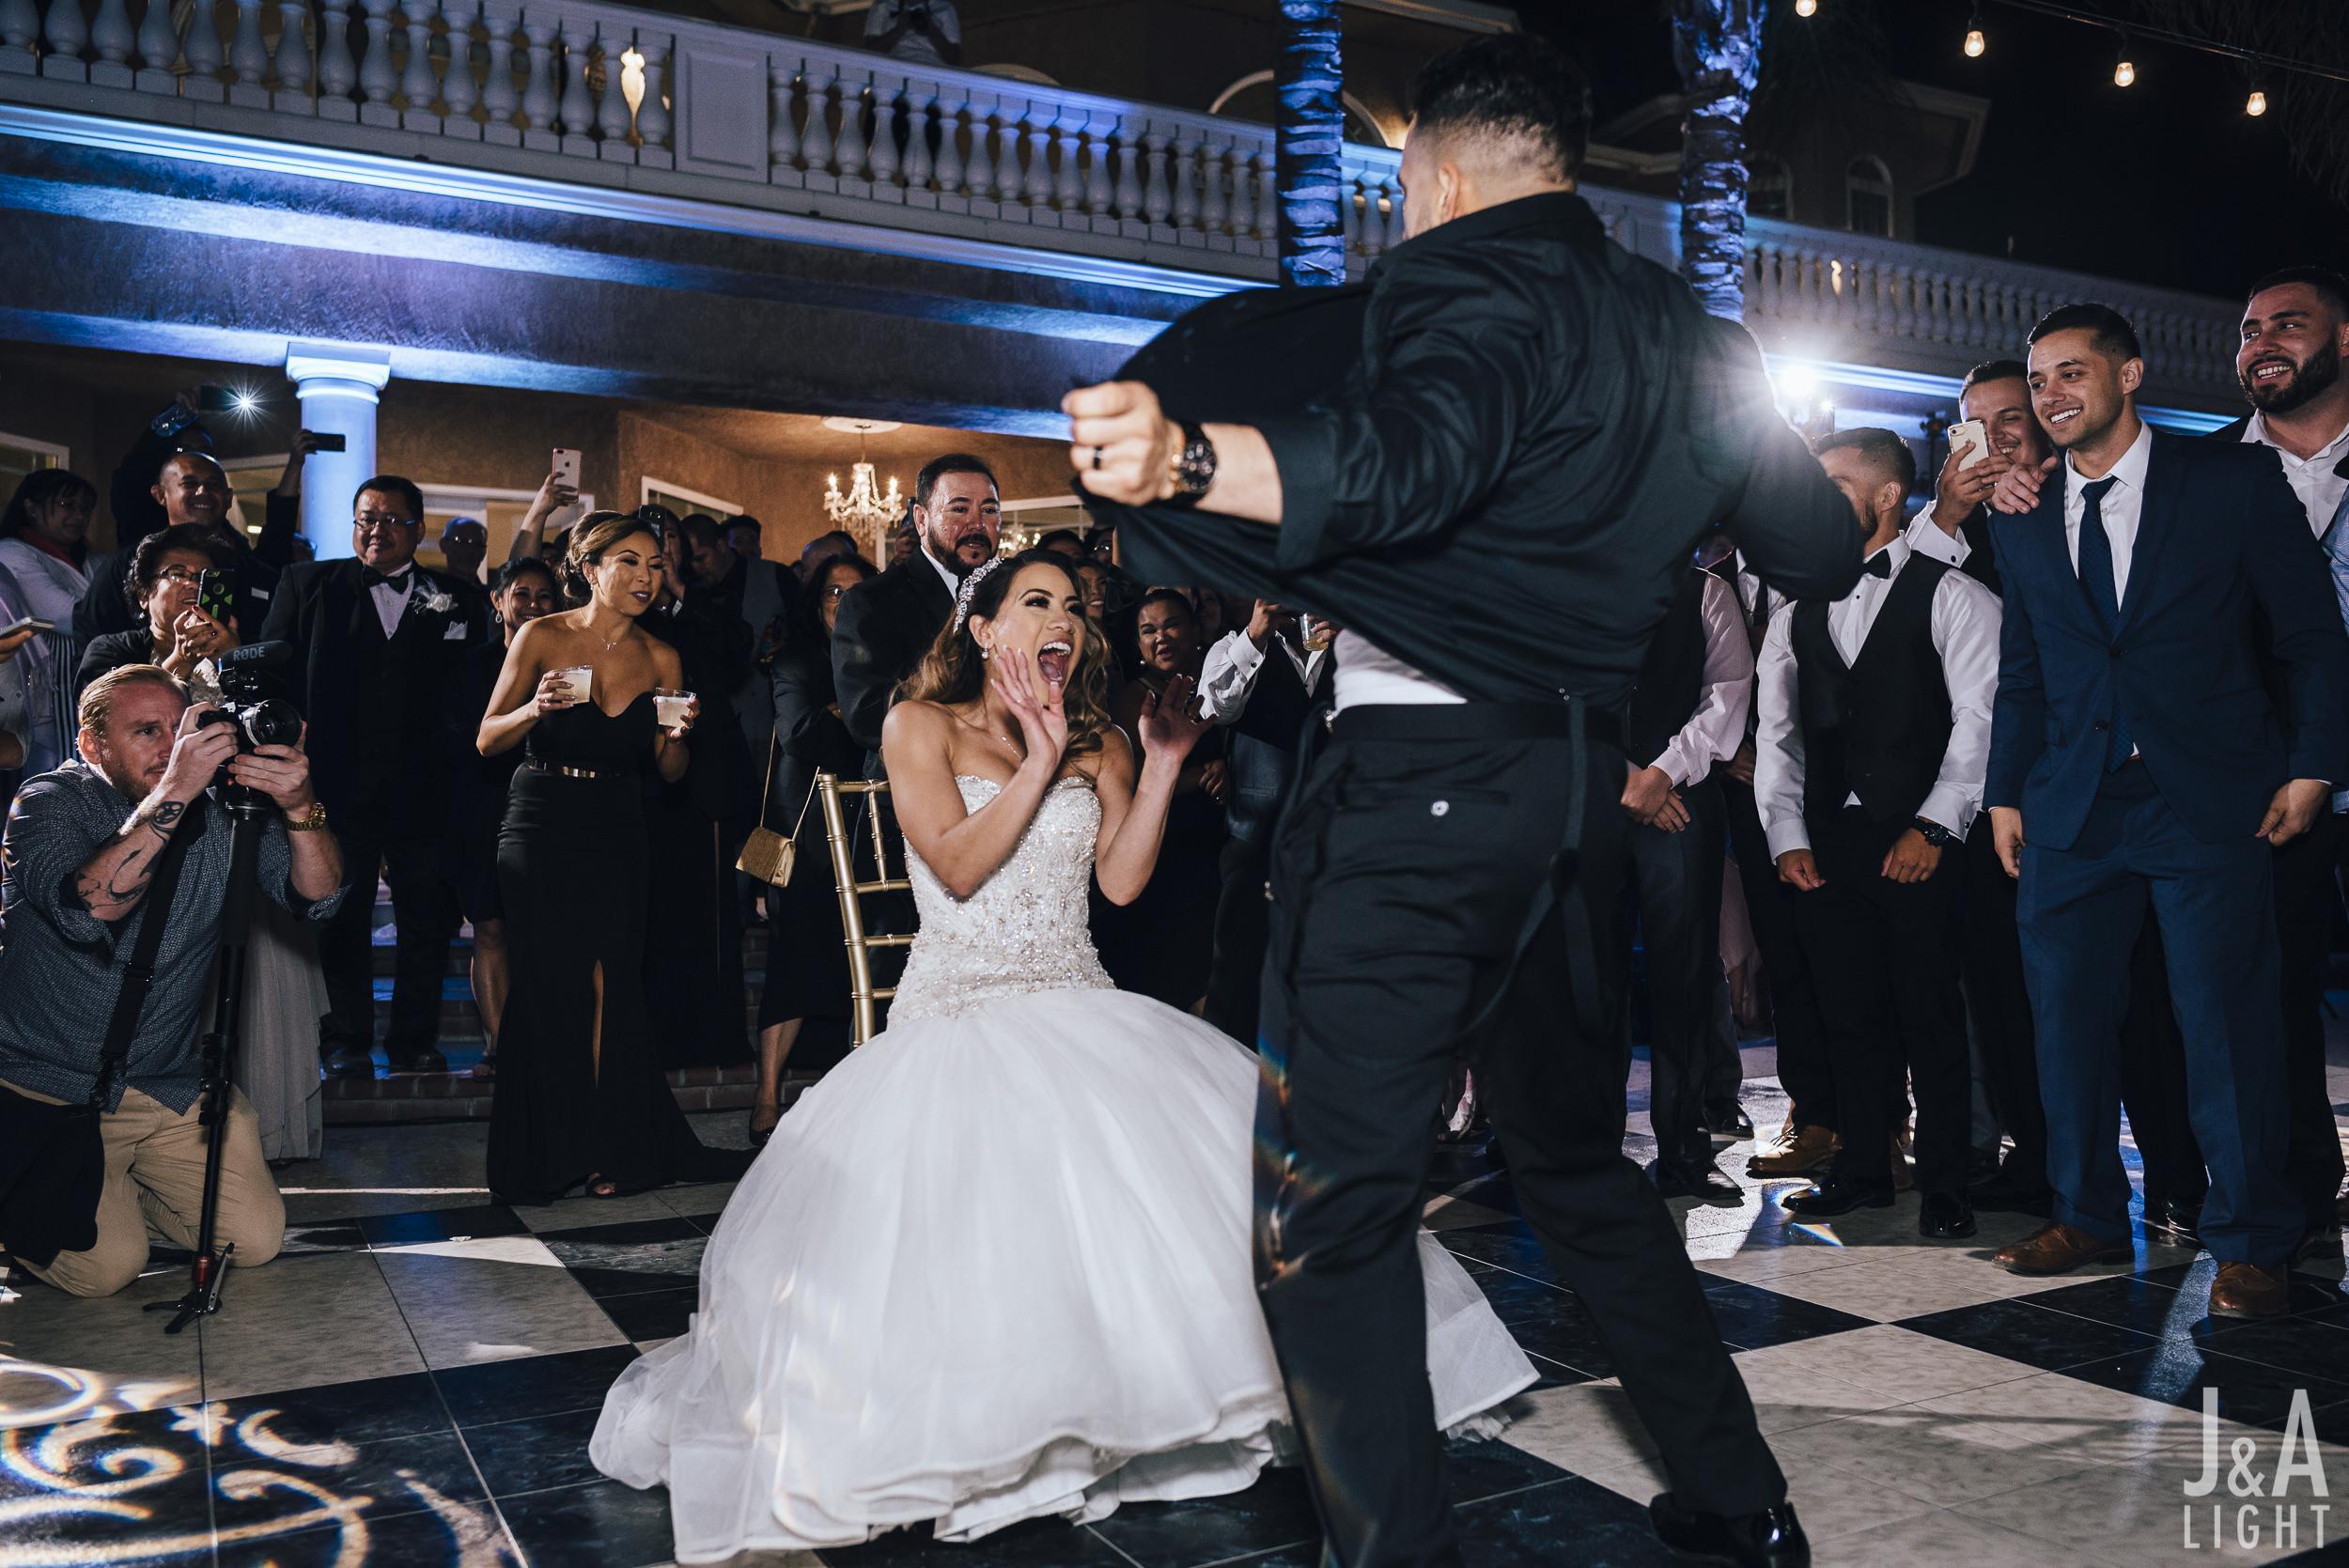 20171014-JanDan-LosBanos-GlassMansion-Wedding-Blog-086.jpg